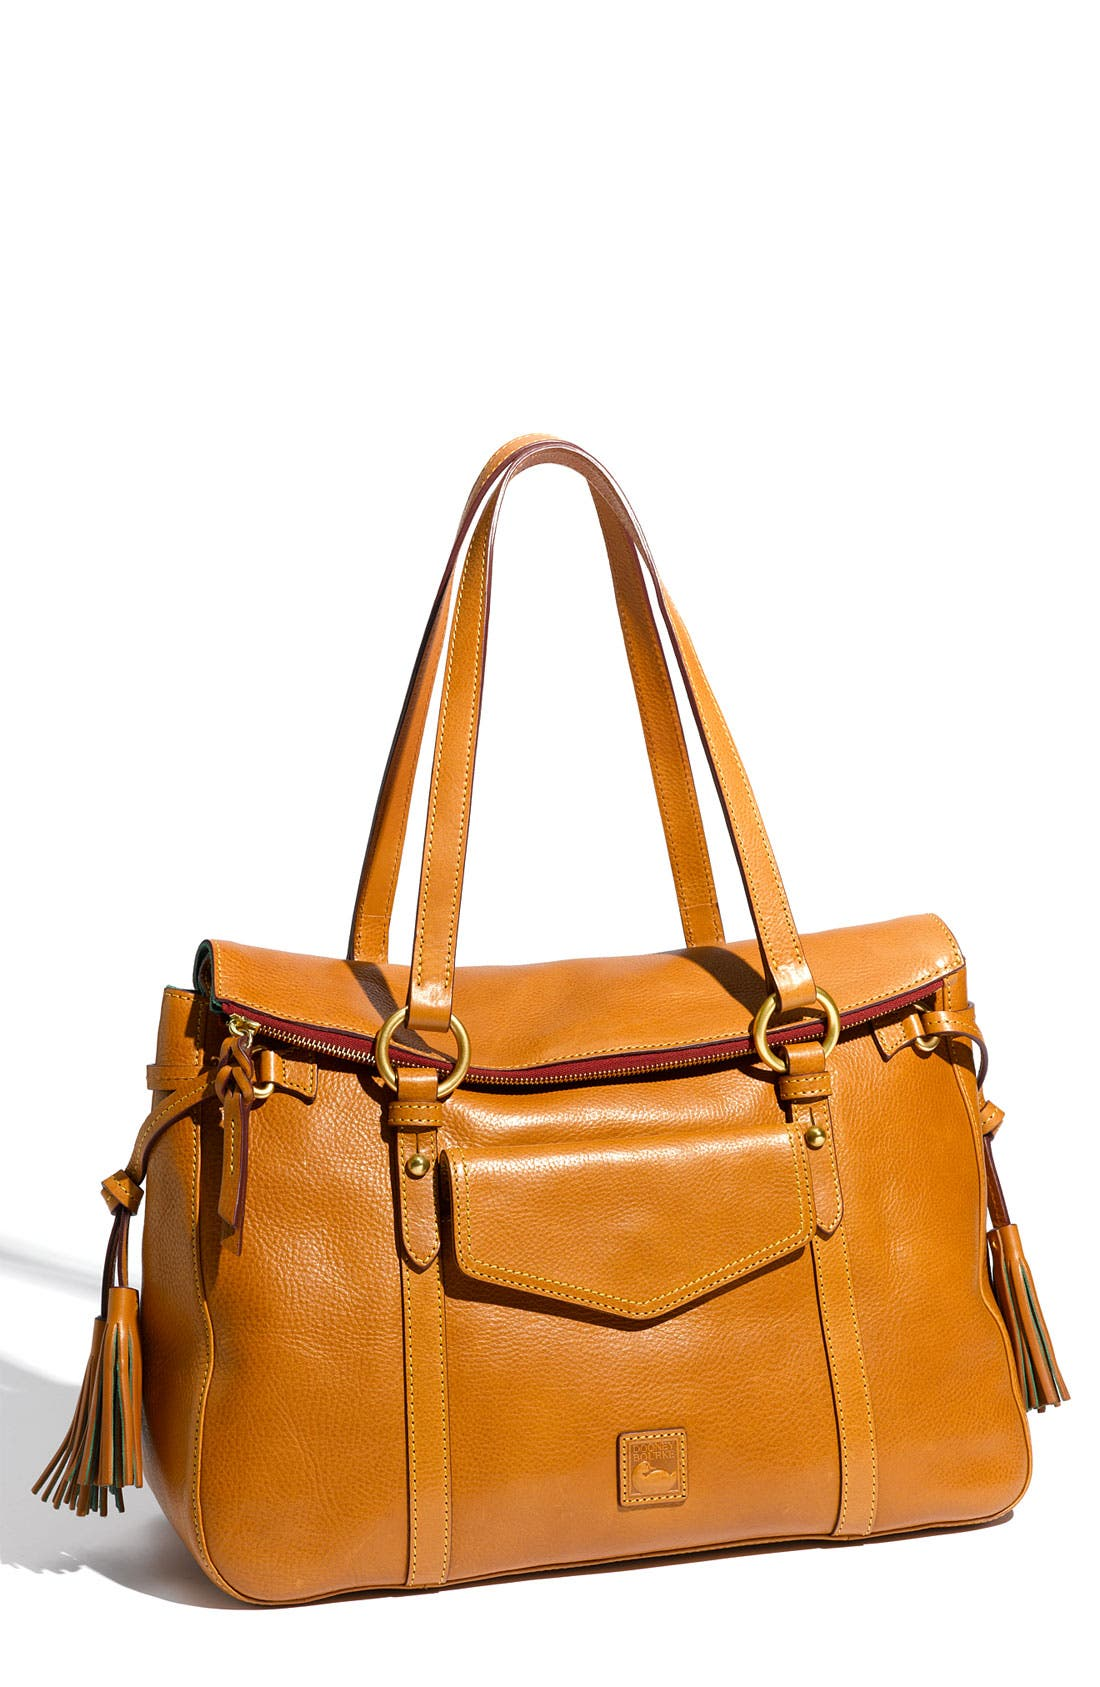 Main Image - Dooney & Bourke 'Pocket' Shopper